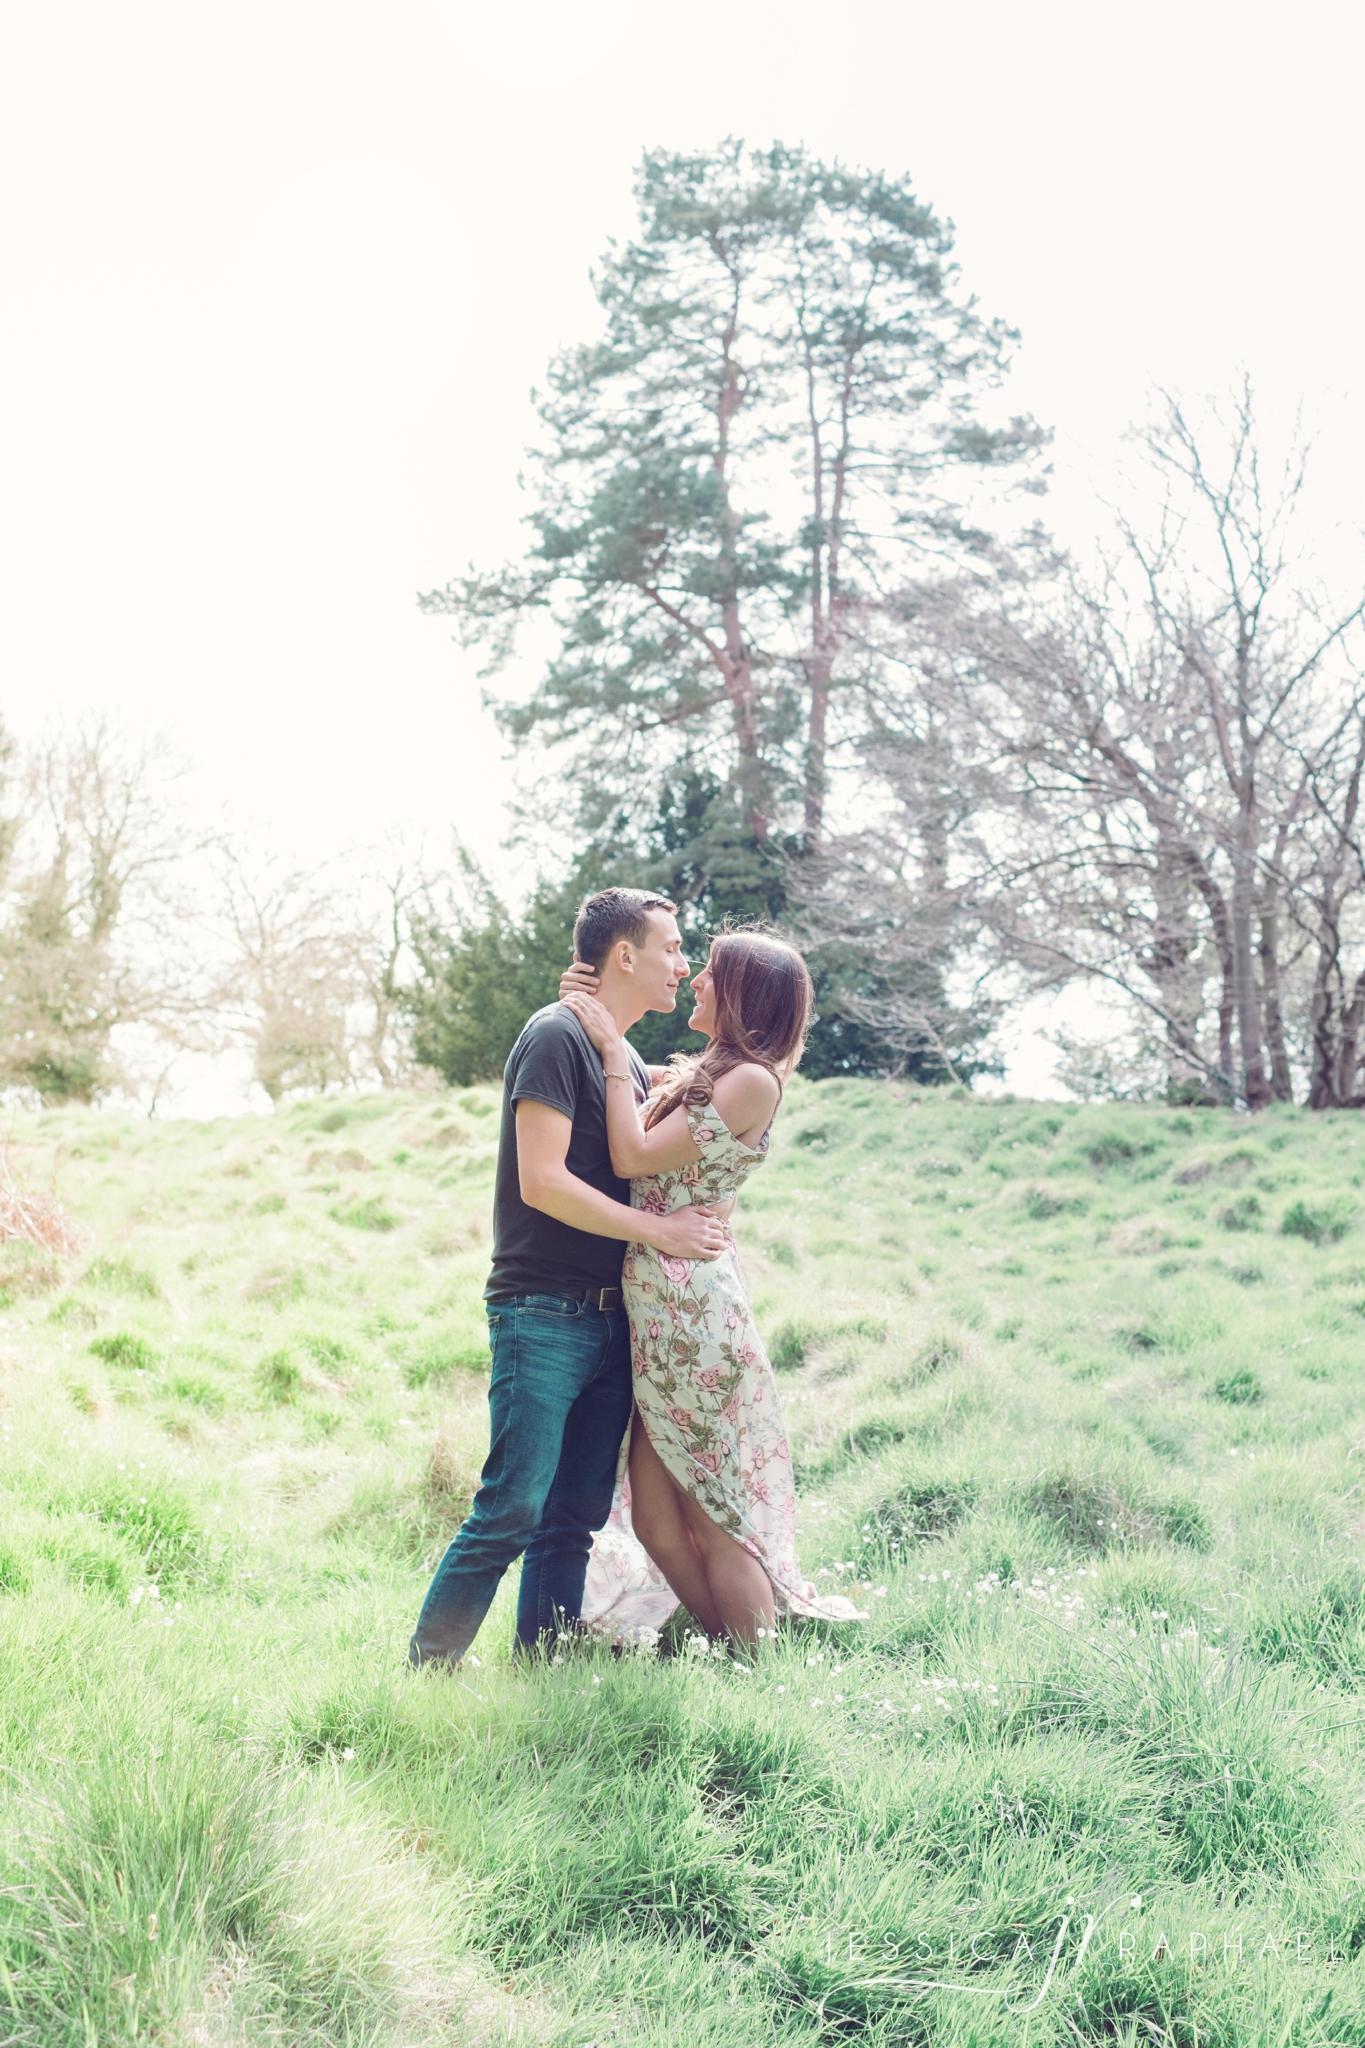 engagement-photography-spring-jessica-raphael-photography-bristol-wedding-photographer